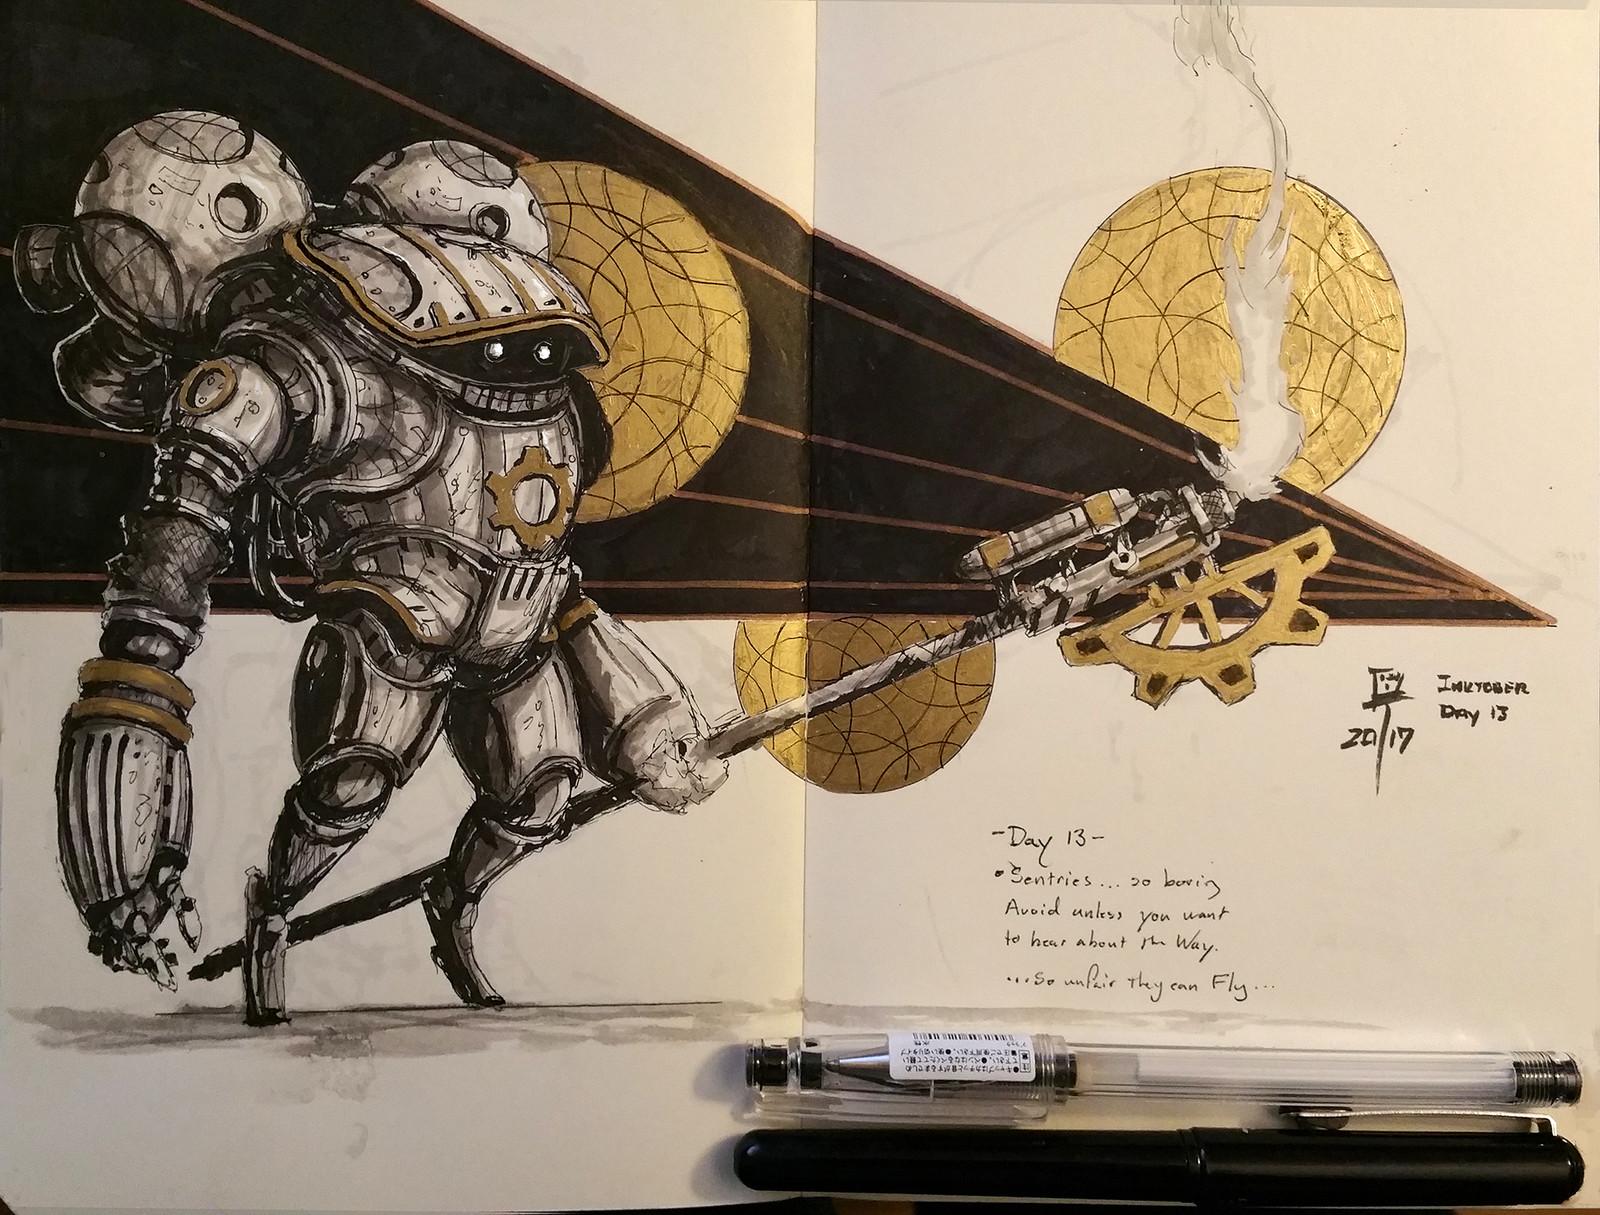 Inktober #13: Sentries